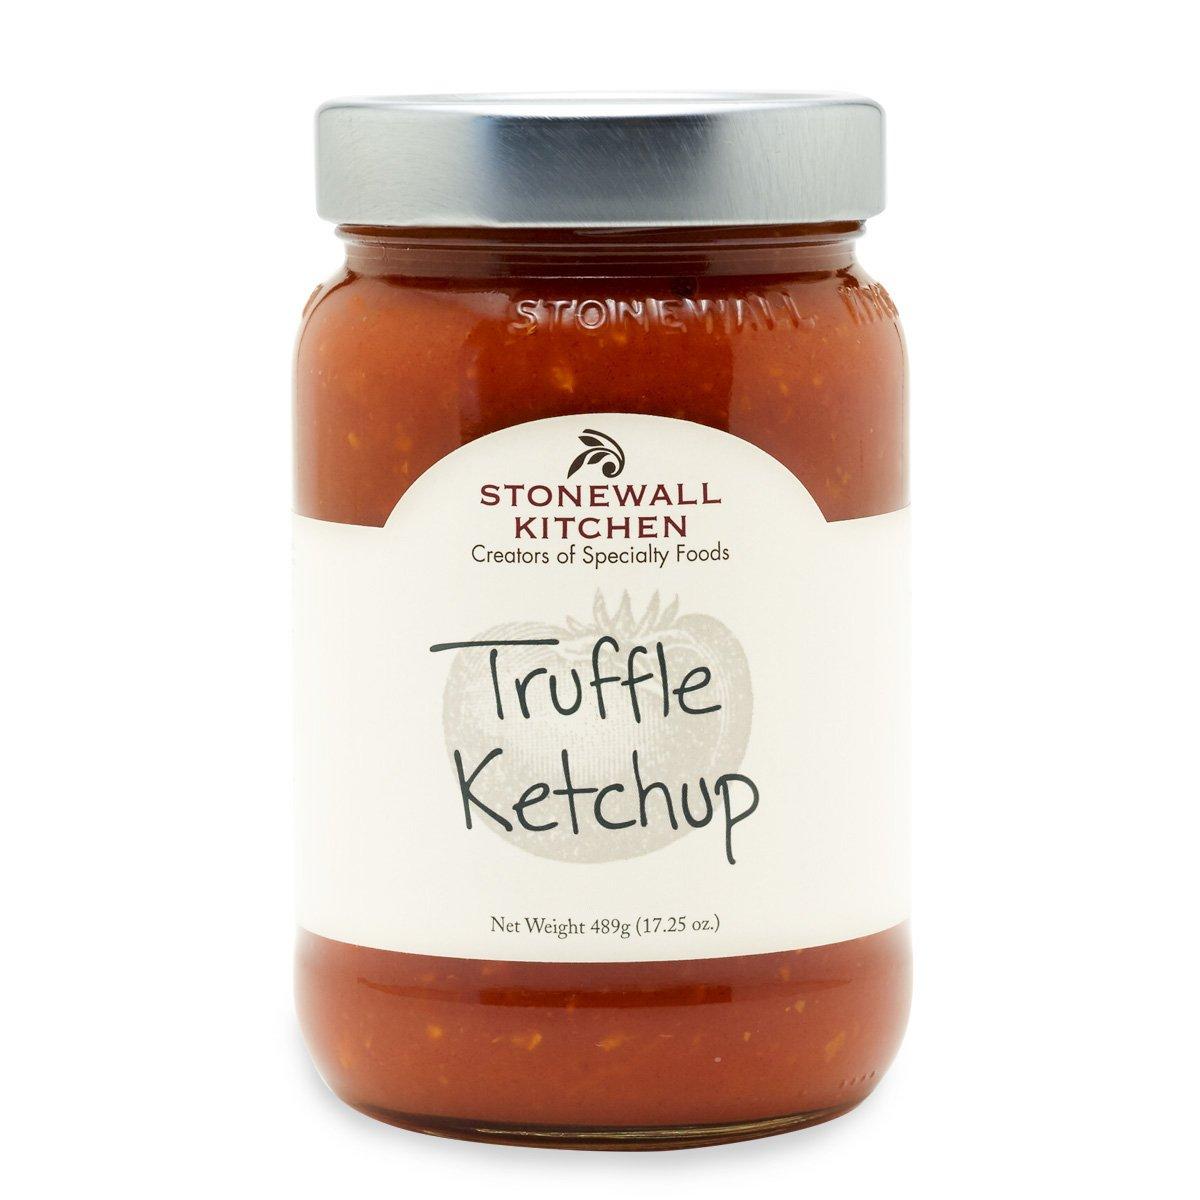 Stonewall Kitchen Truffle Ketchup, 17.25 Ounces